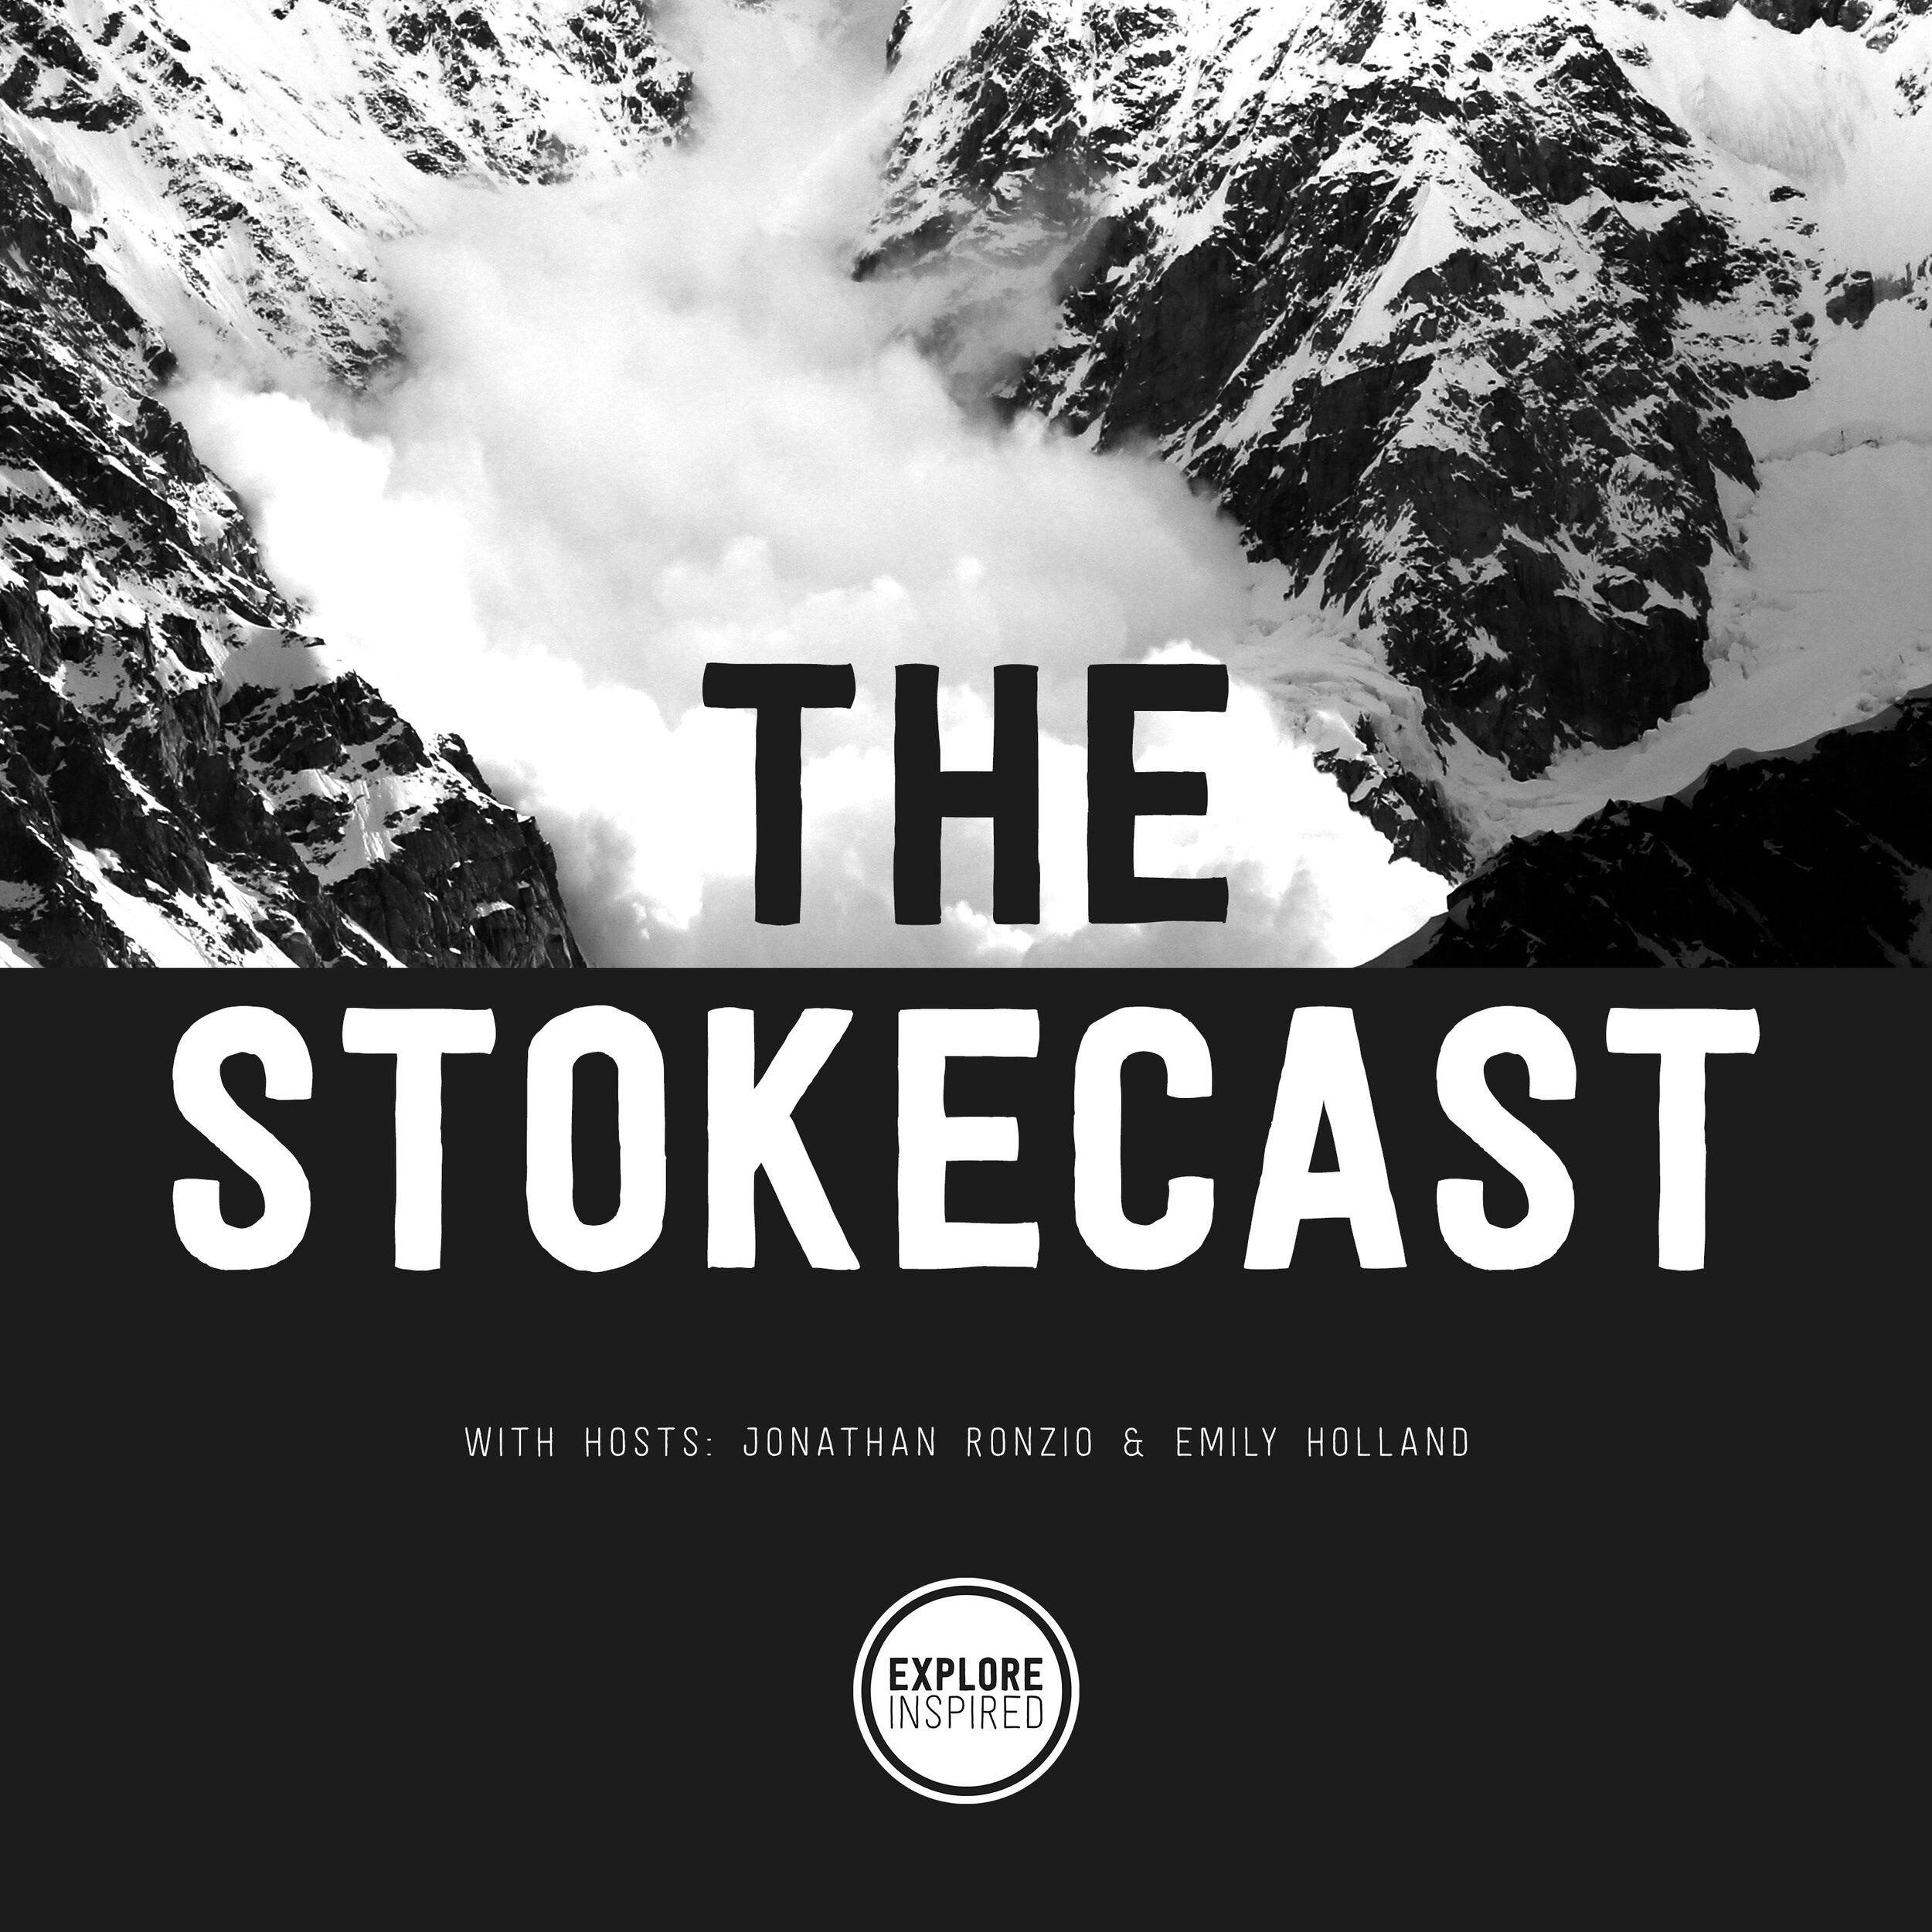 thestokecast-cover.jpg